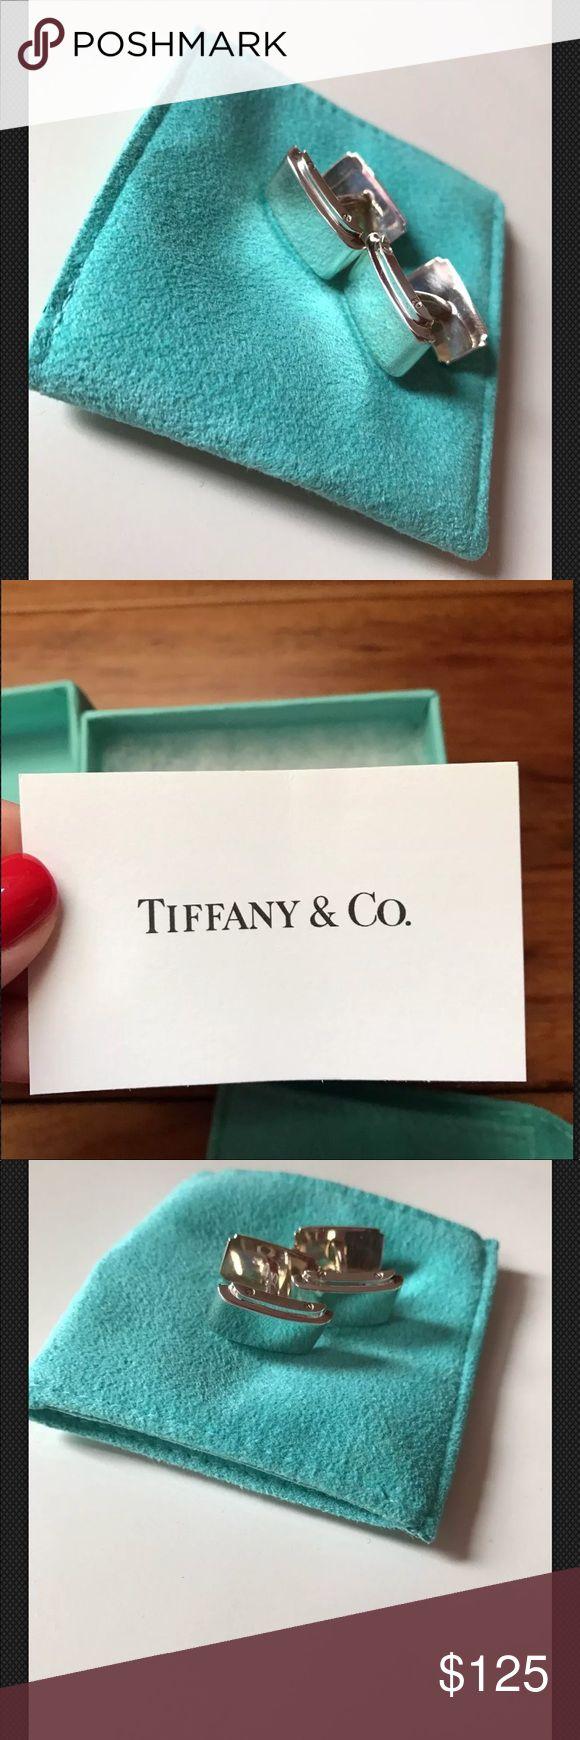 Tiffany Cufflinks Tiffany Cufflinks Tiffany & Co. Accessories Cuff Links